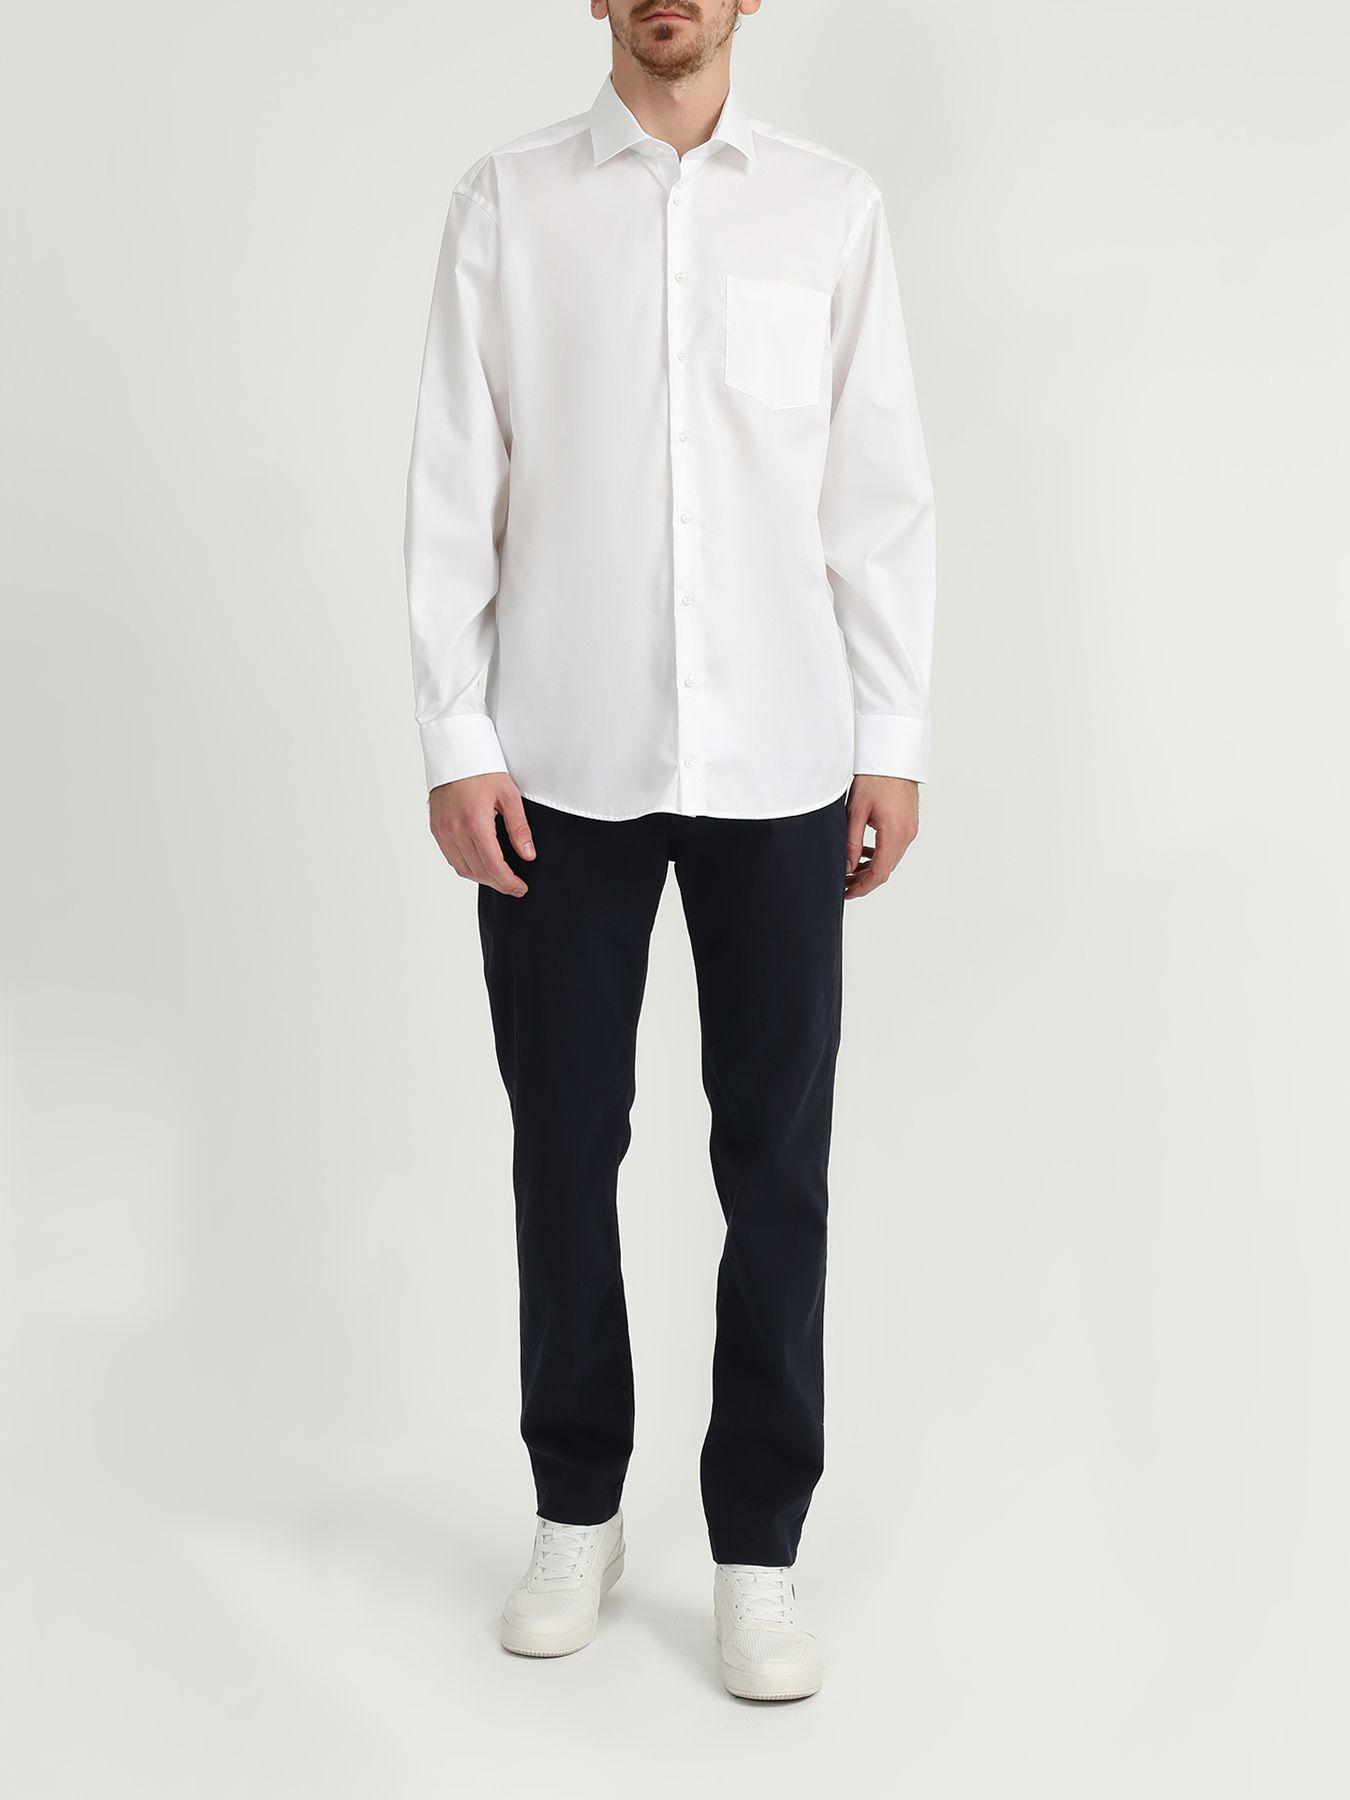 Фото - Рубашка Seidensticker Рубашка с нагрудным карманом рубашка lime рубашка с карманом